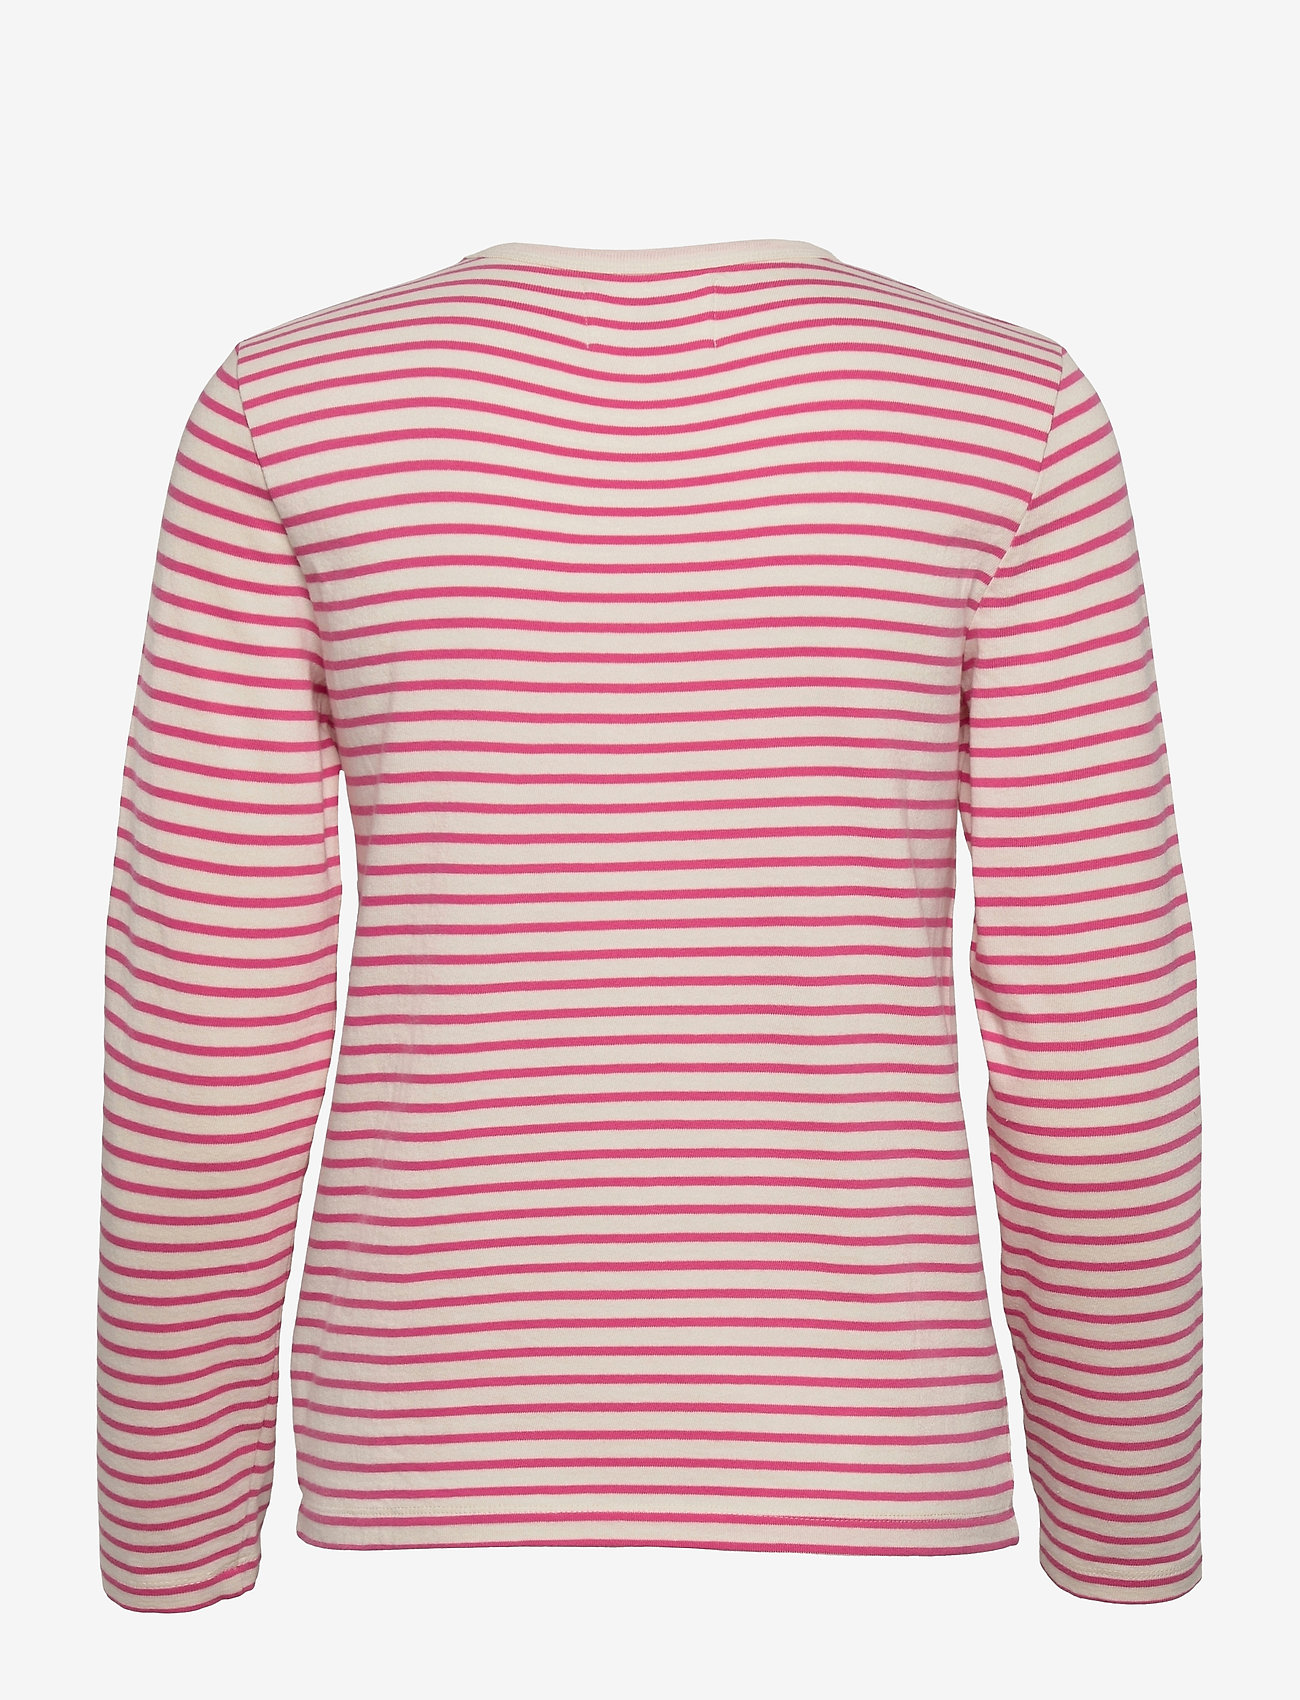 Wood Wood - Moa stripe long sleeve - langærmede toppe - off-white/pink stripes - 1